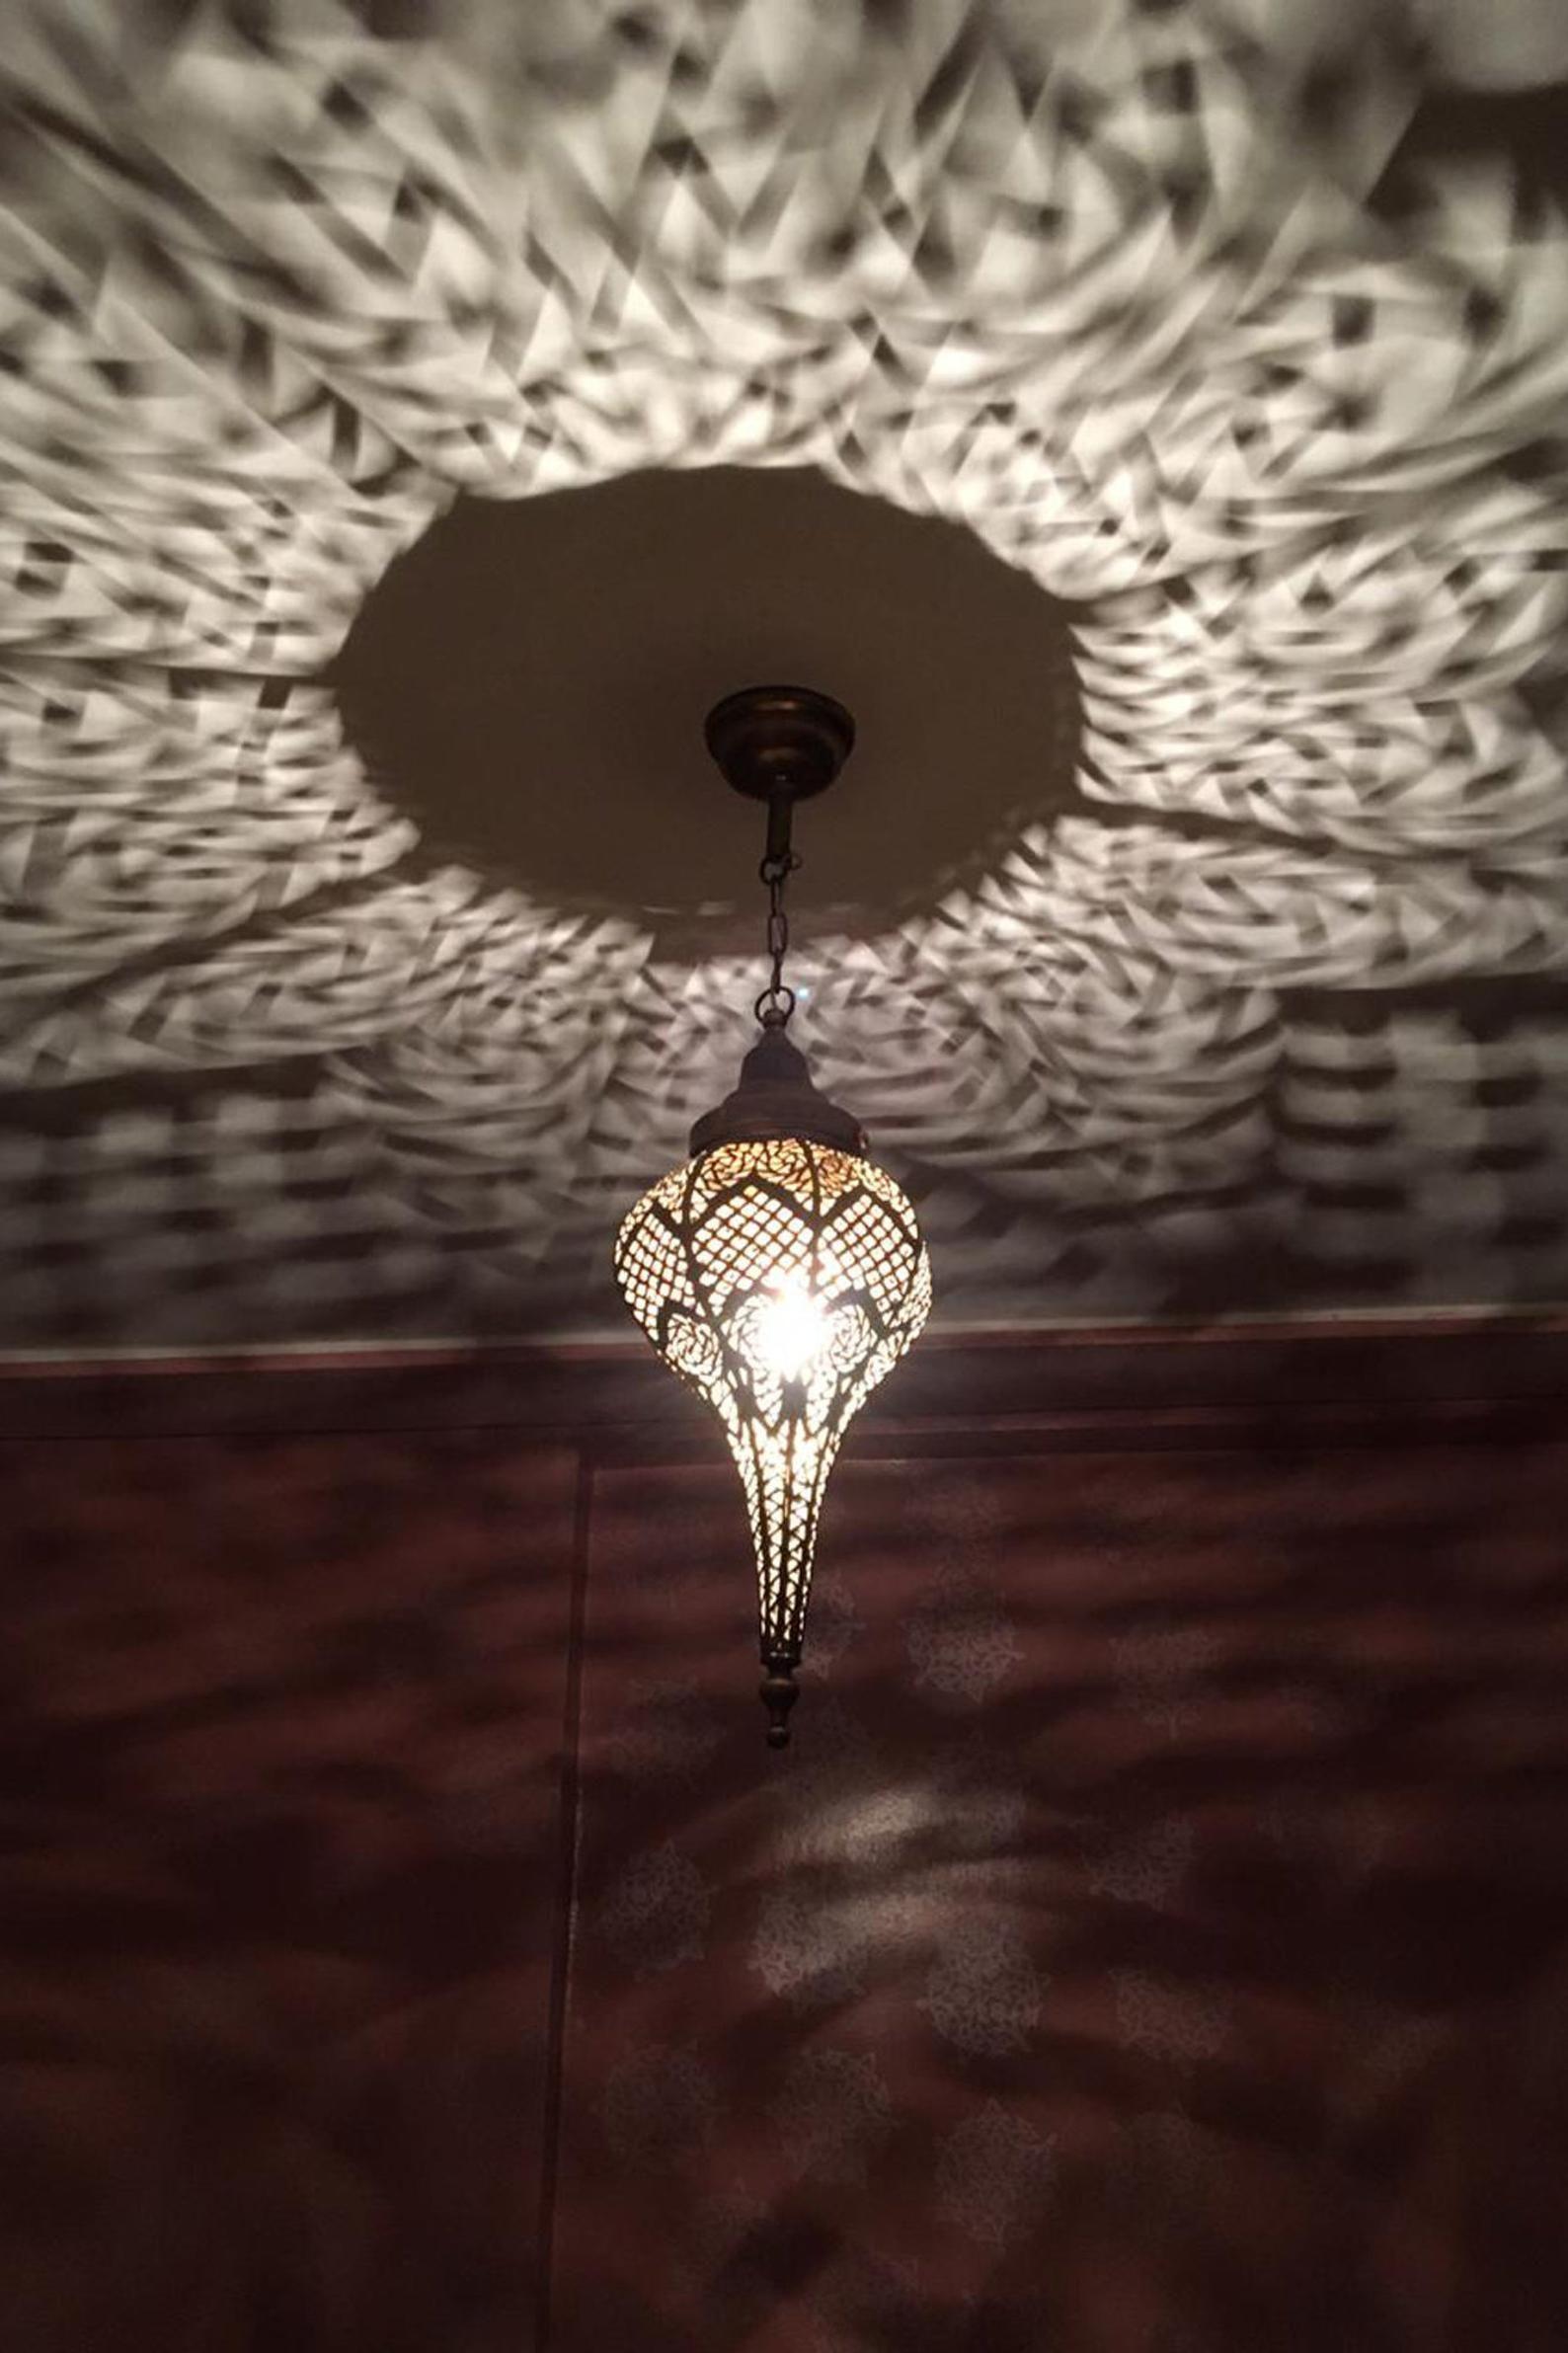 Decoration Lighting Moroccan Pendant Light Hanging Ceiling Etsy Pendant Lamp Hanging Lights Hanging Ceiling Lights